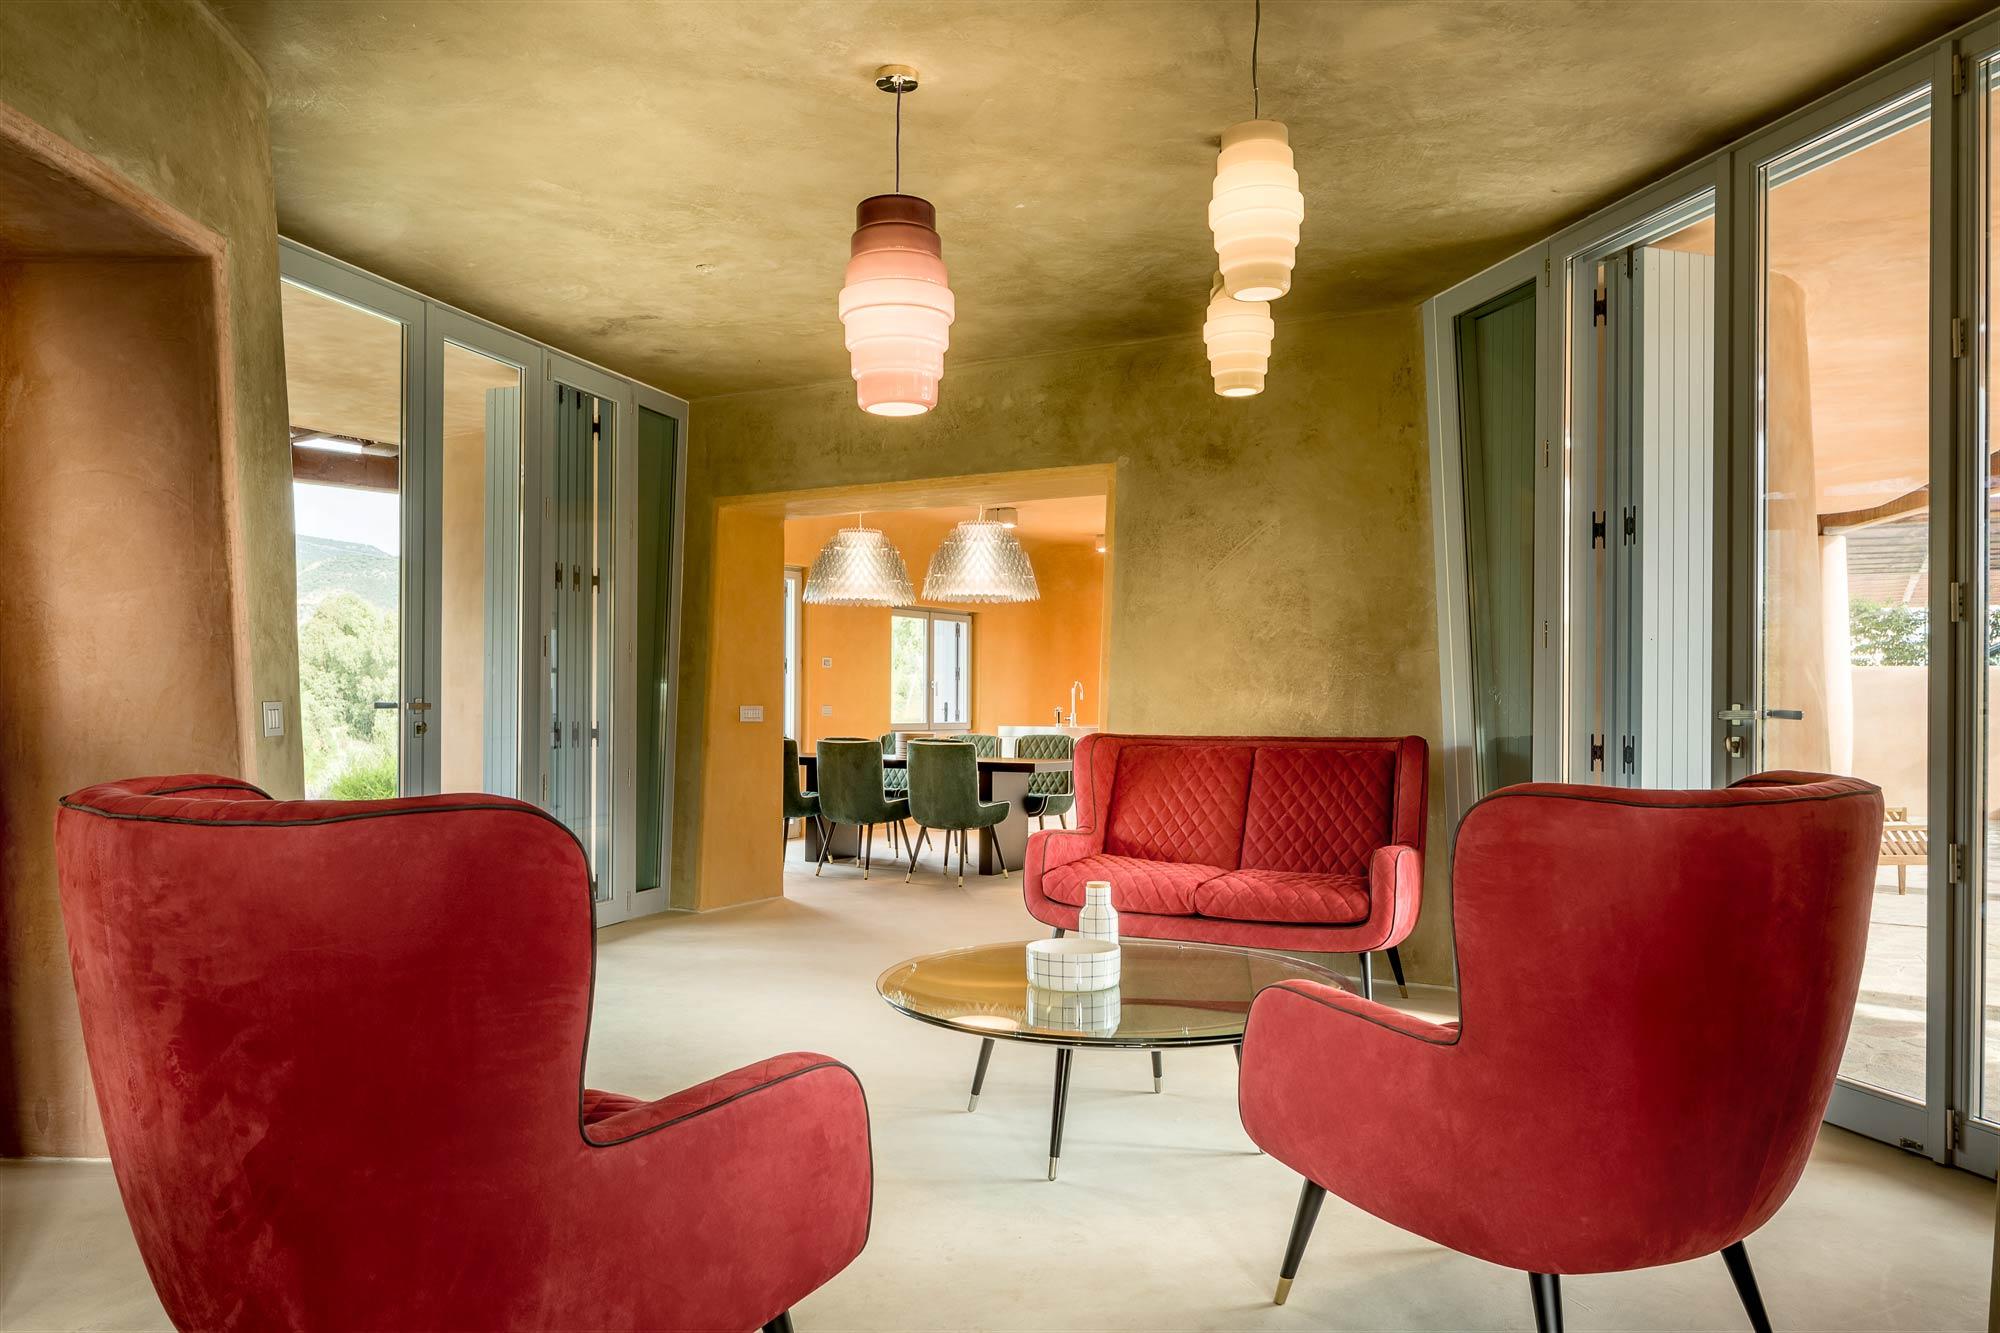 Is Molas - Villa Nea Lounge Area